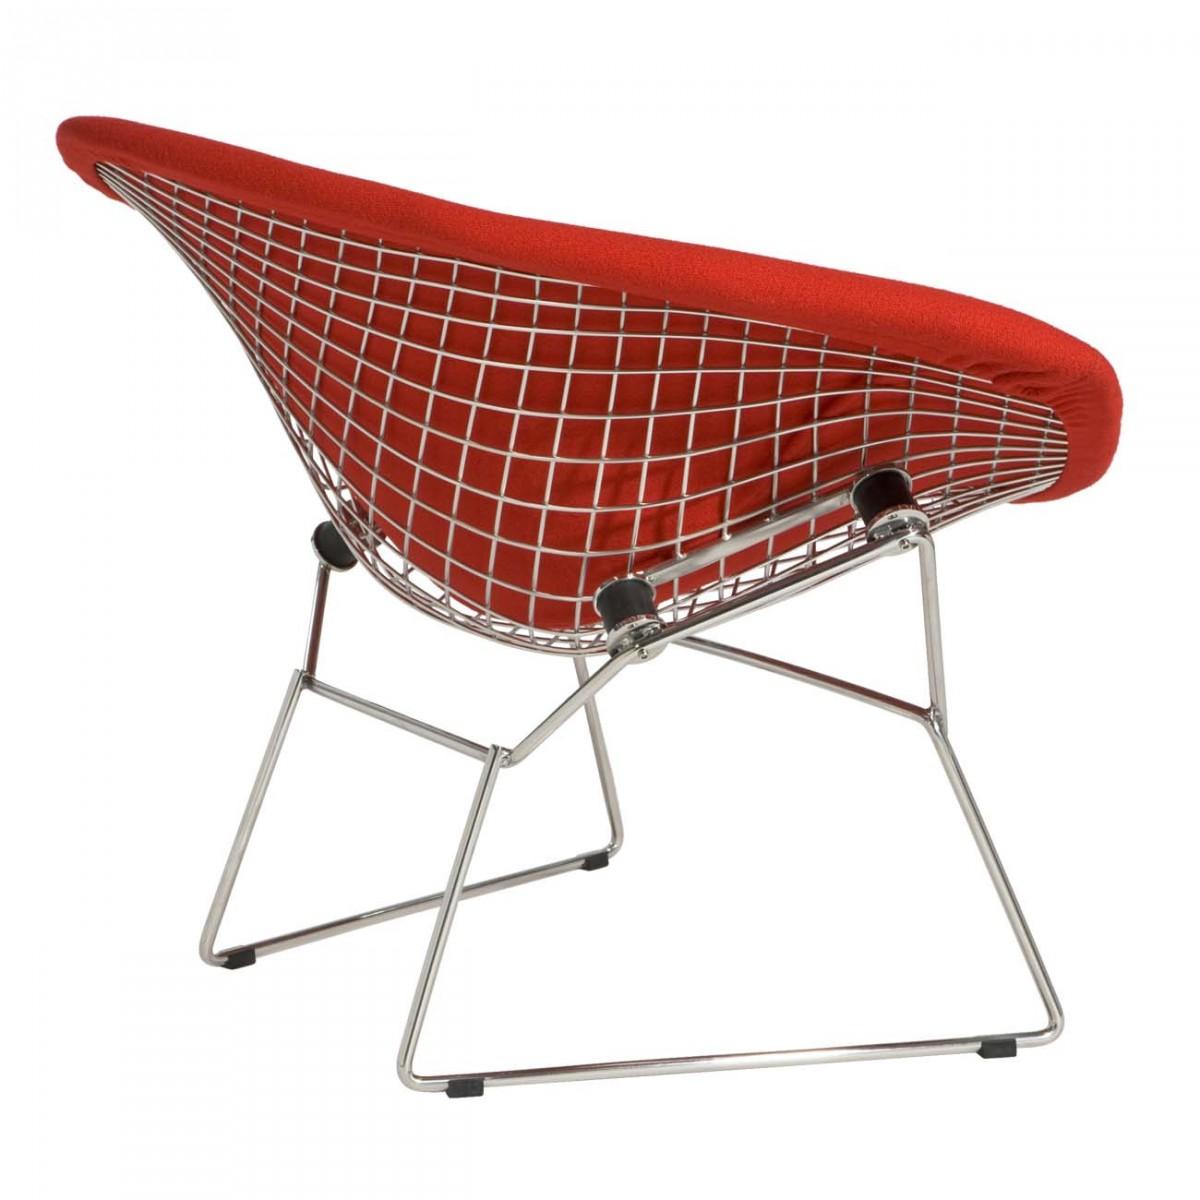 Diamond Chair Full Upholstery Inspired By Harry Bertoia